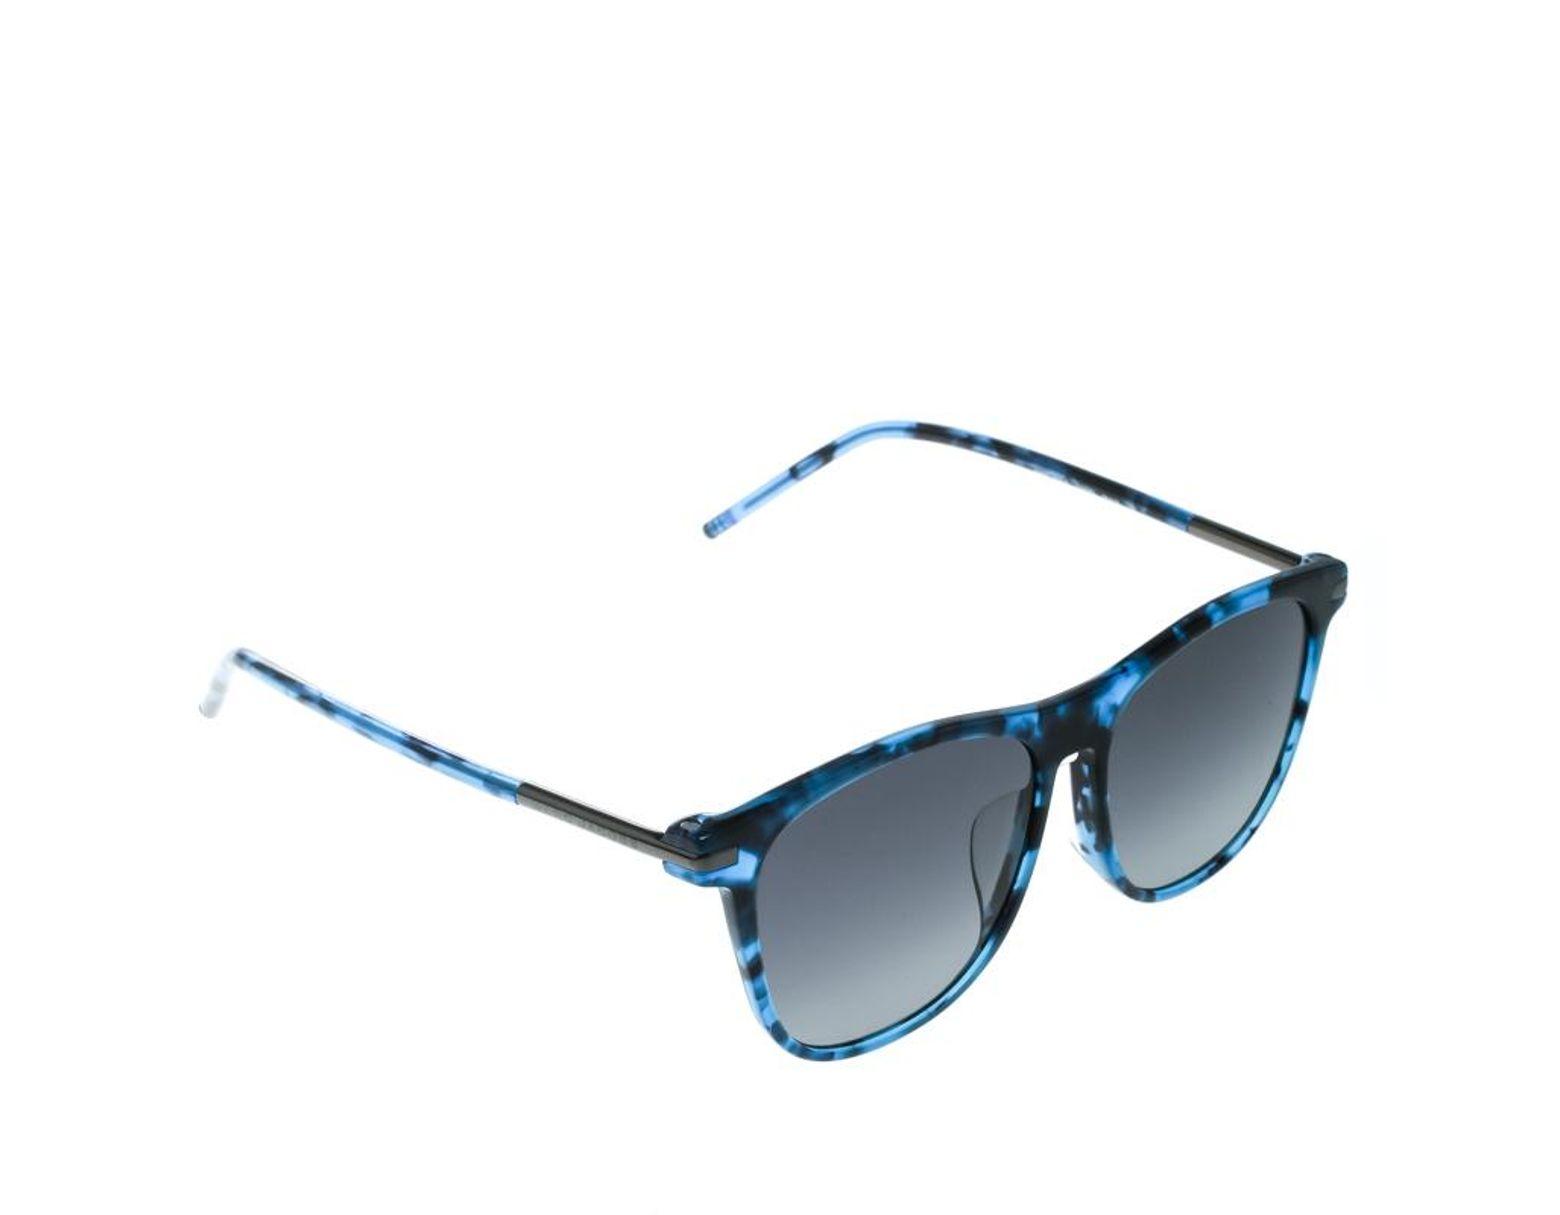 a1b00b625dbd Marc Jacobs Blue Tortoise / Grey Marc 86/f/s Square Sunglasses in Gray -  Lyst